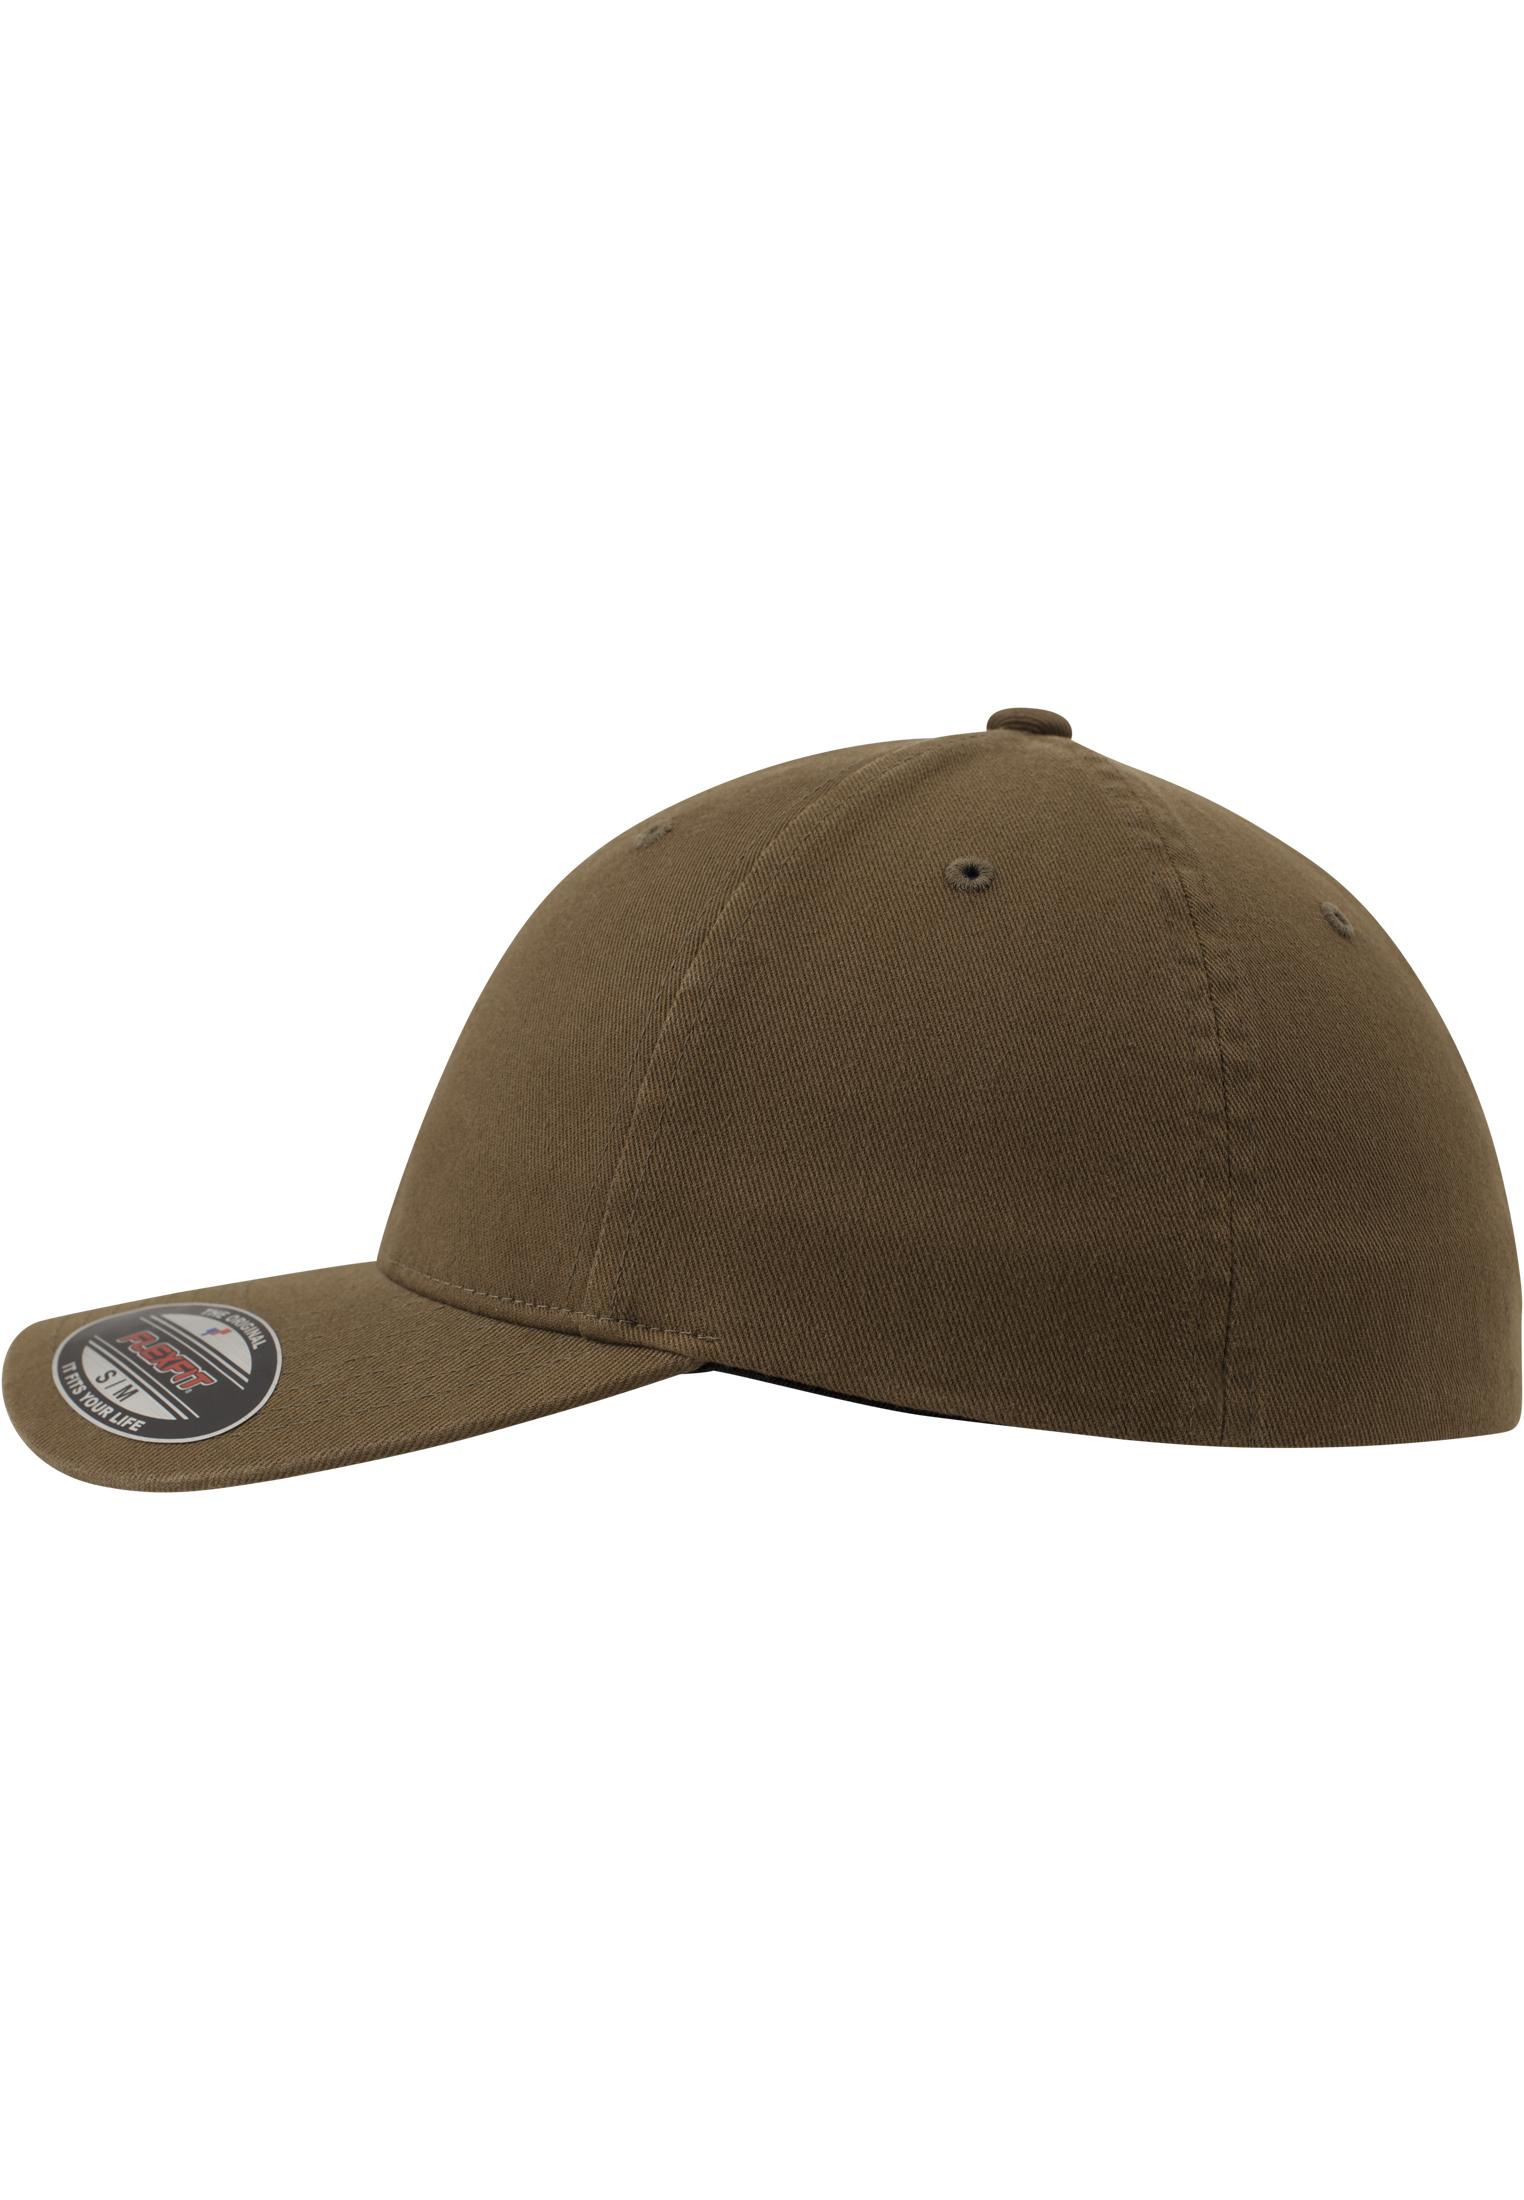 Flexfit Herren Cap Mütze Kappe Baseball Flexfit Garment Washed Camo